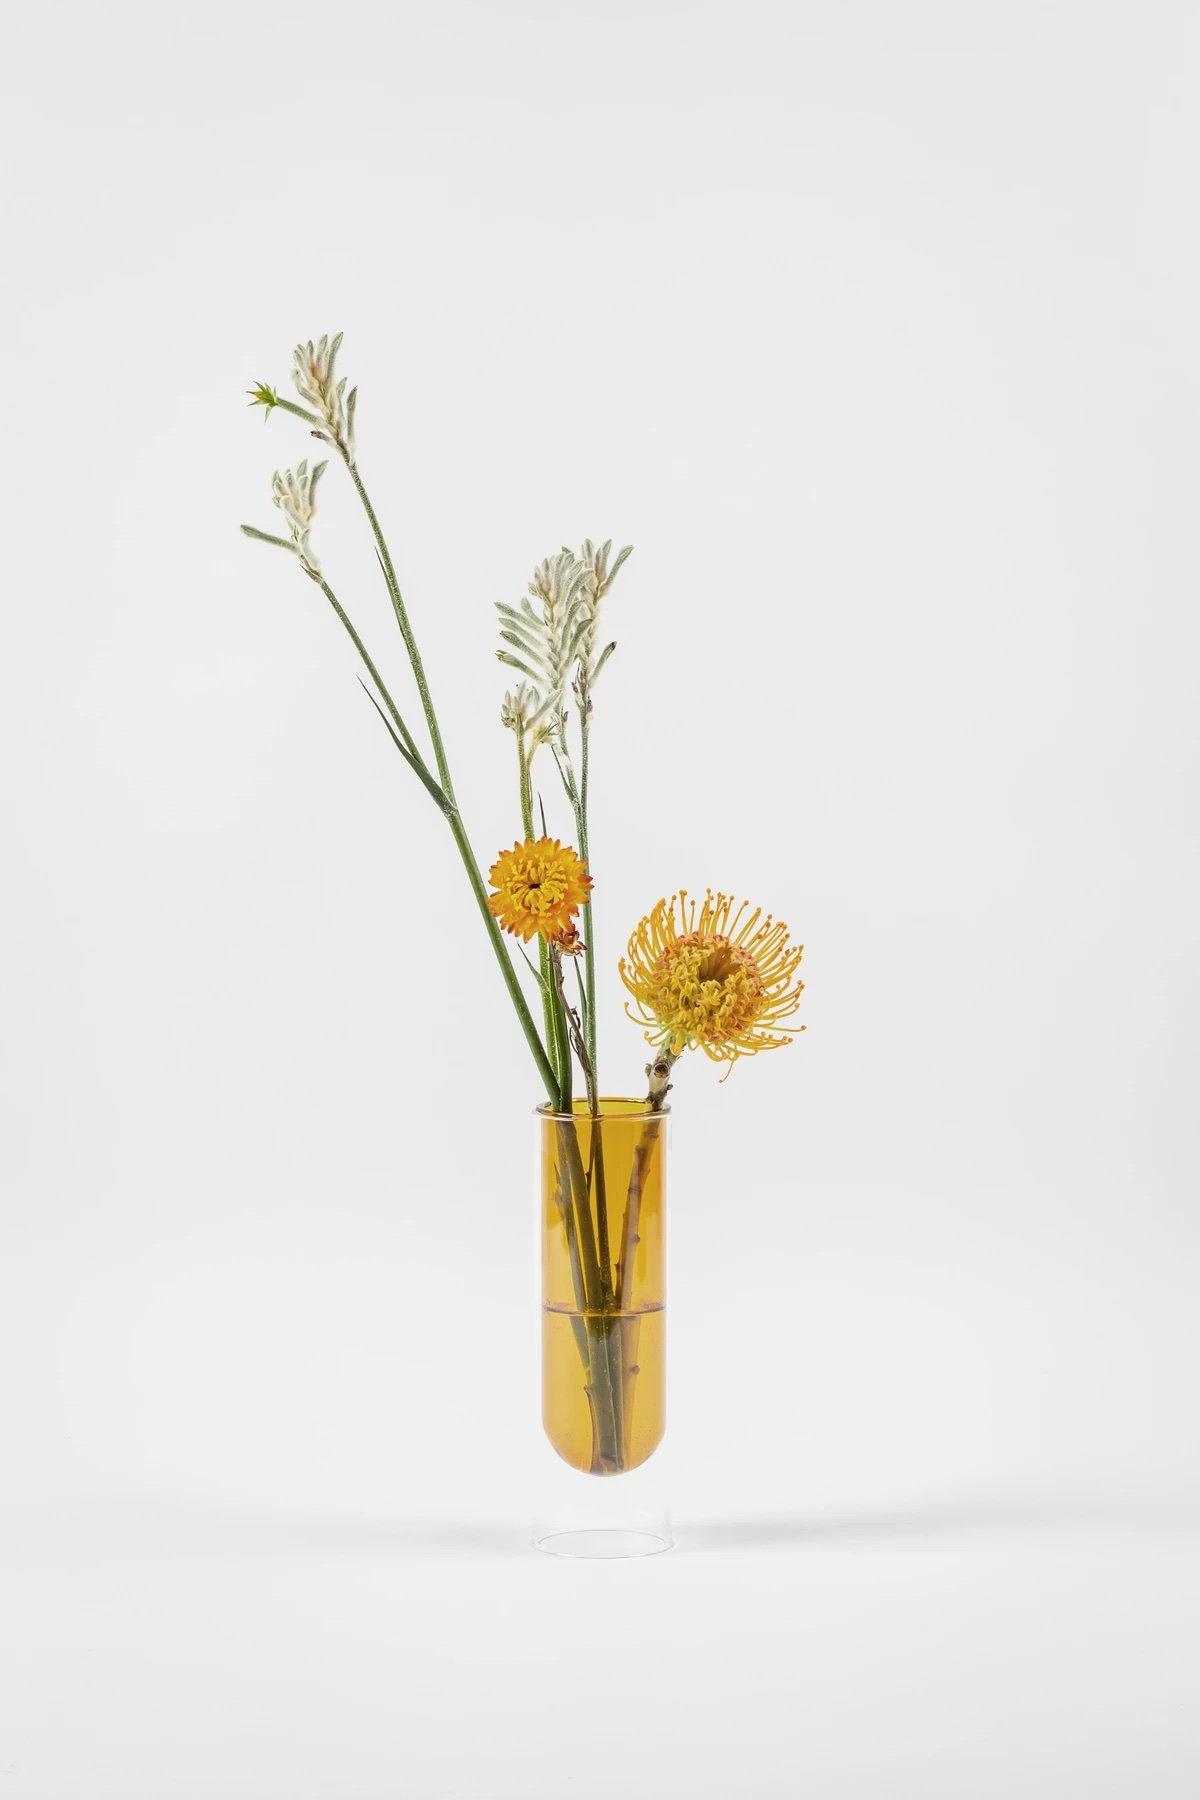 gul-glasvase-cylinder-flowertube-65200-studioabout